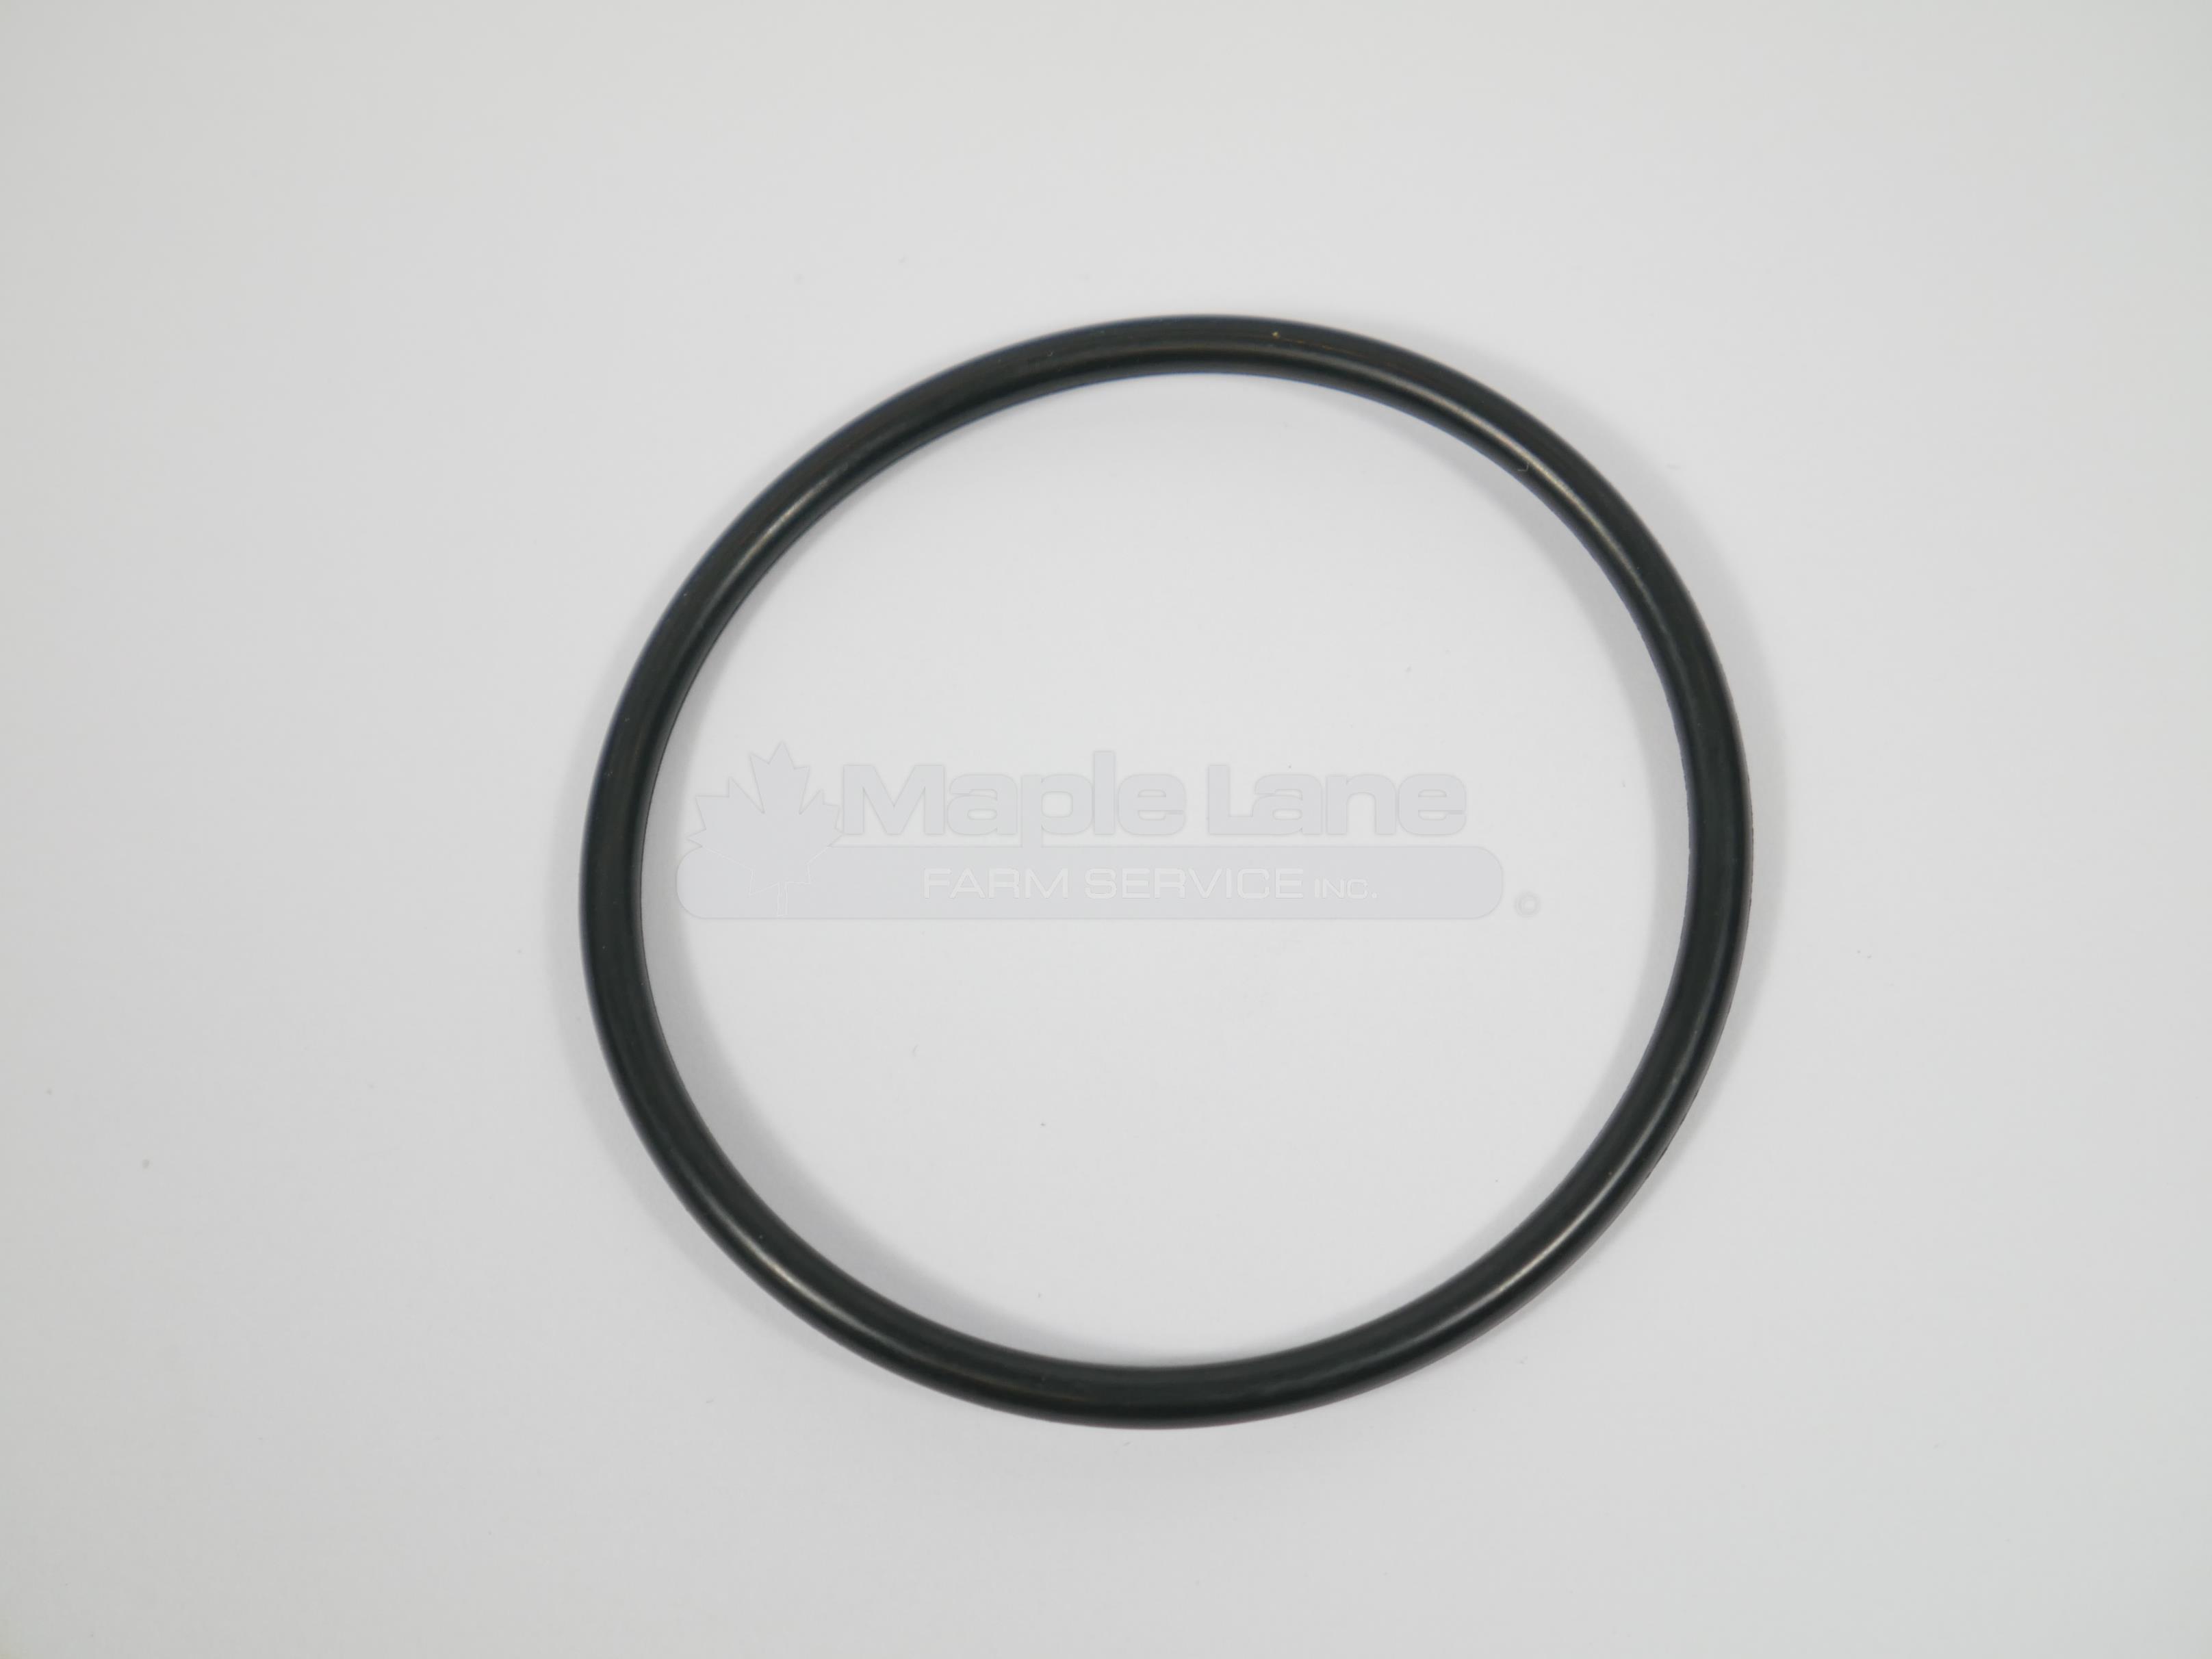 240925 O-Ring